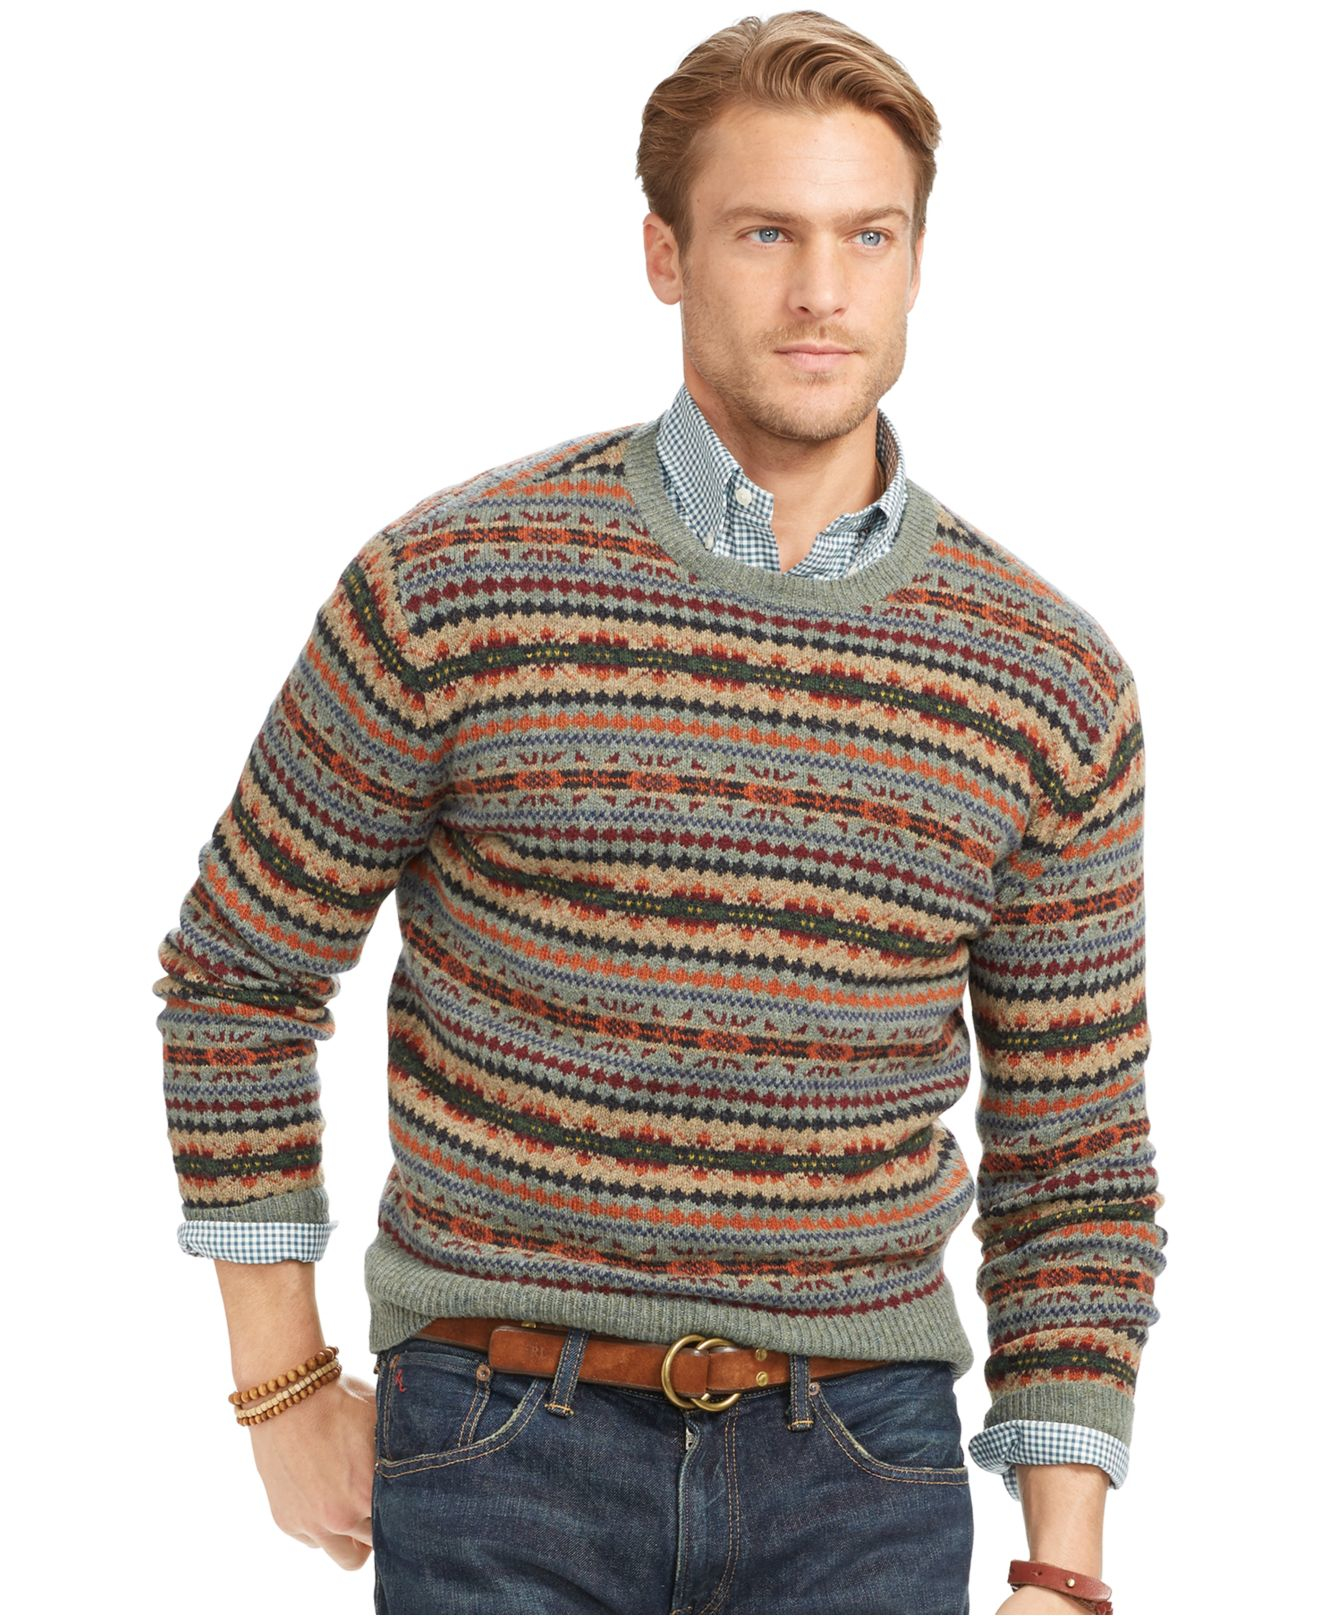 polo ralph lauren fair isle merino wool sweater for men lyst. Black Bedroom Furniture Sets. Home Design Ideas